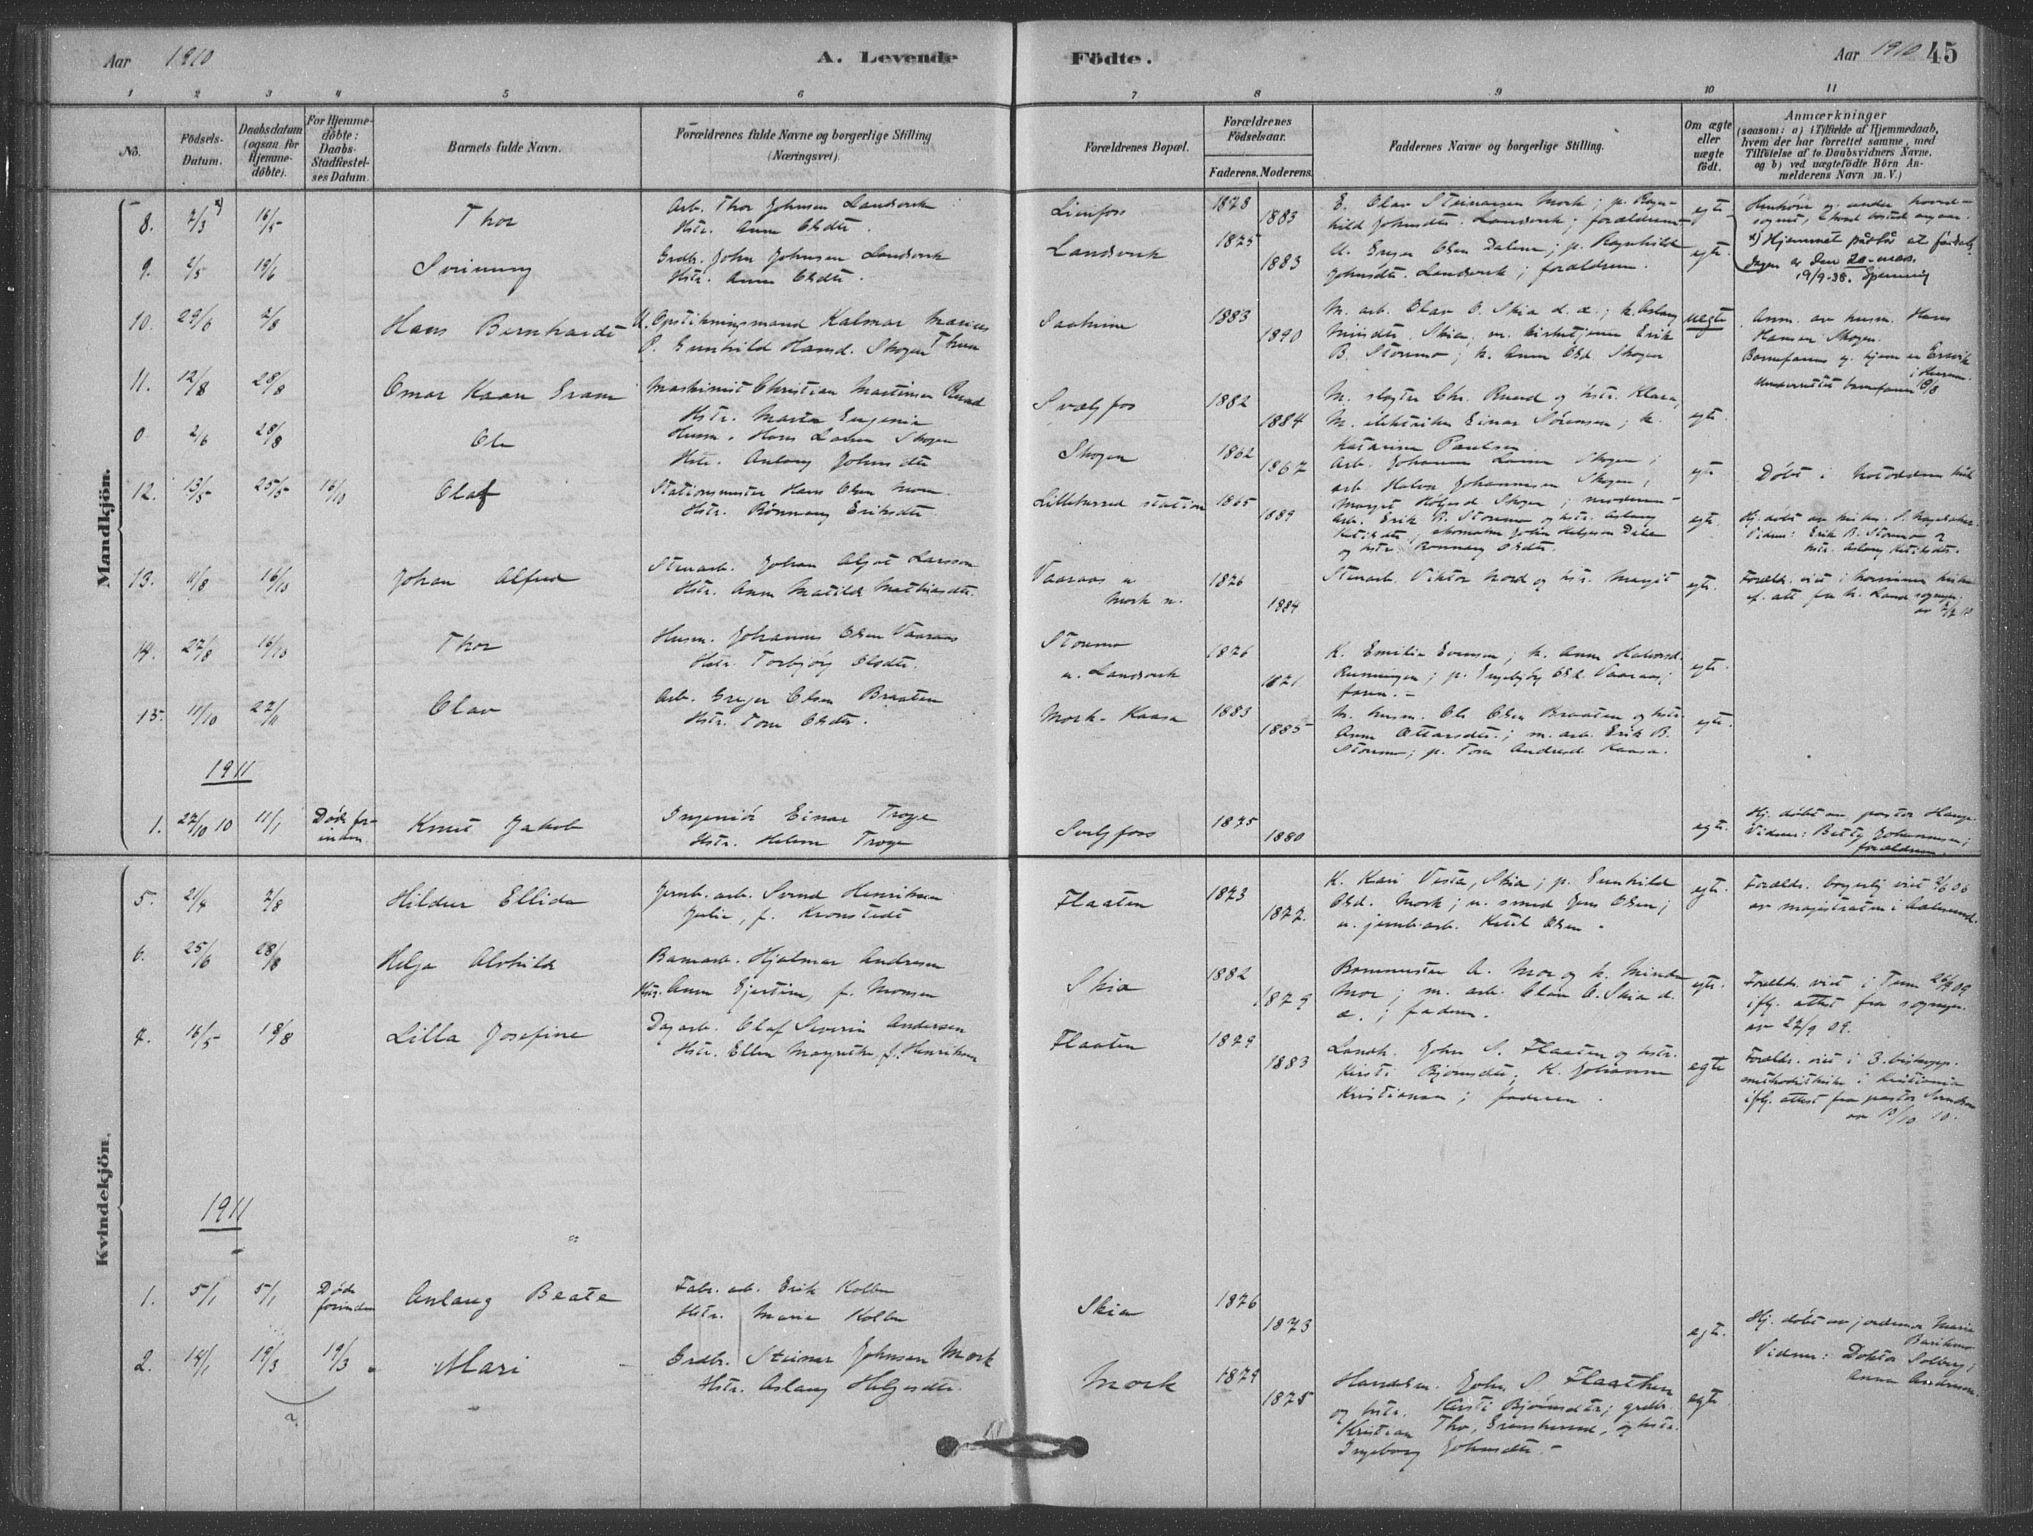 SAKO, Heddal kirkebøker, F/Fb/L0002: Ministerialbok nr. II 2, 1878-1913, s. 45